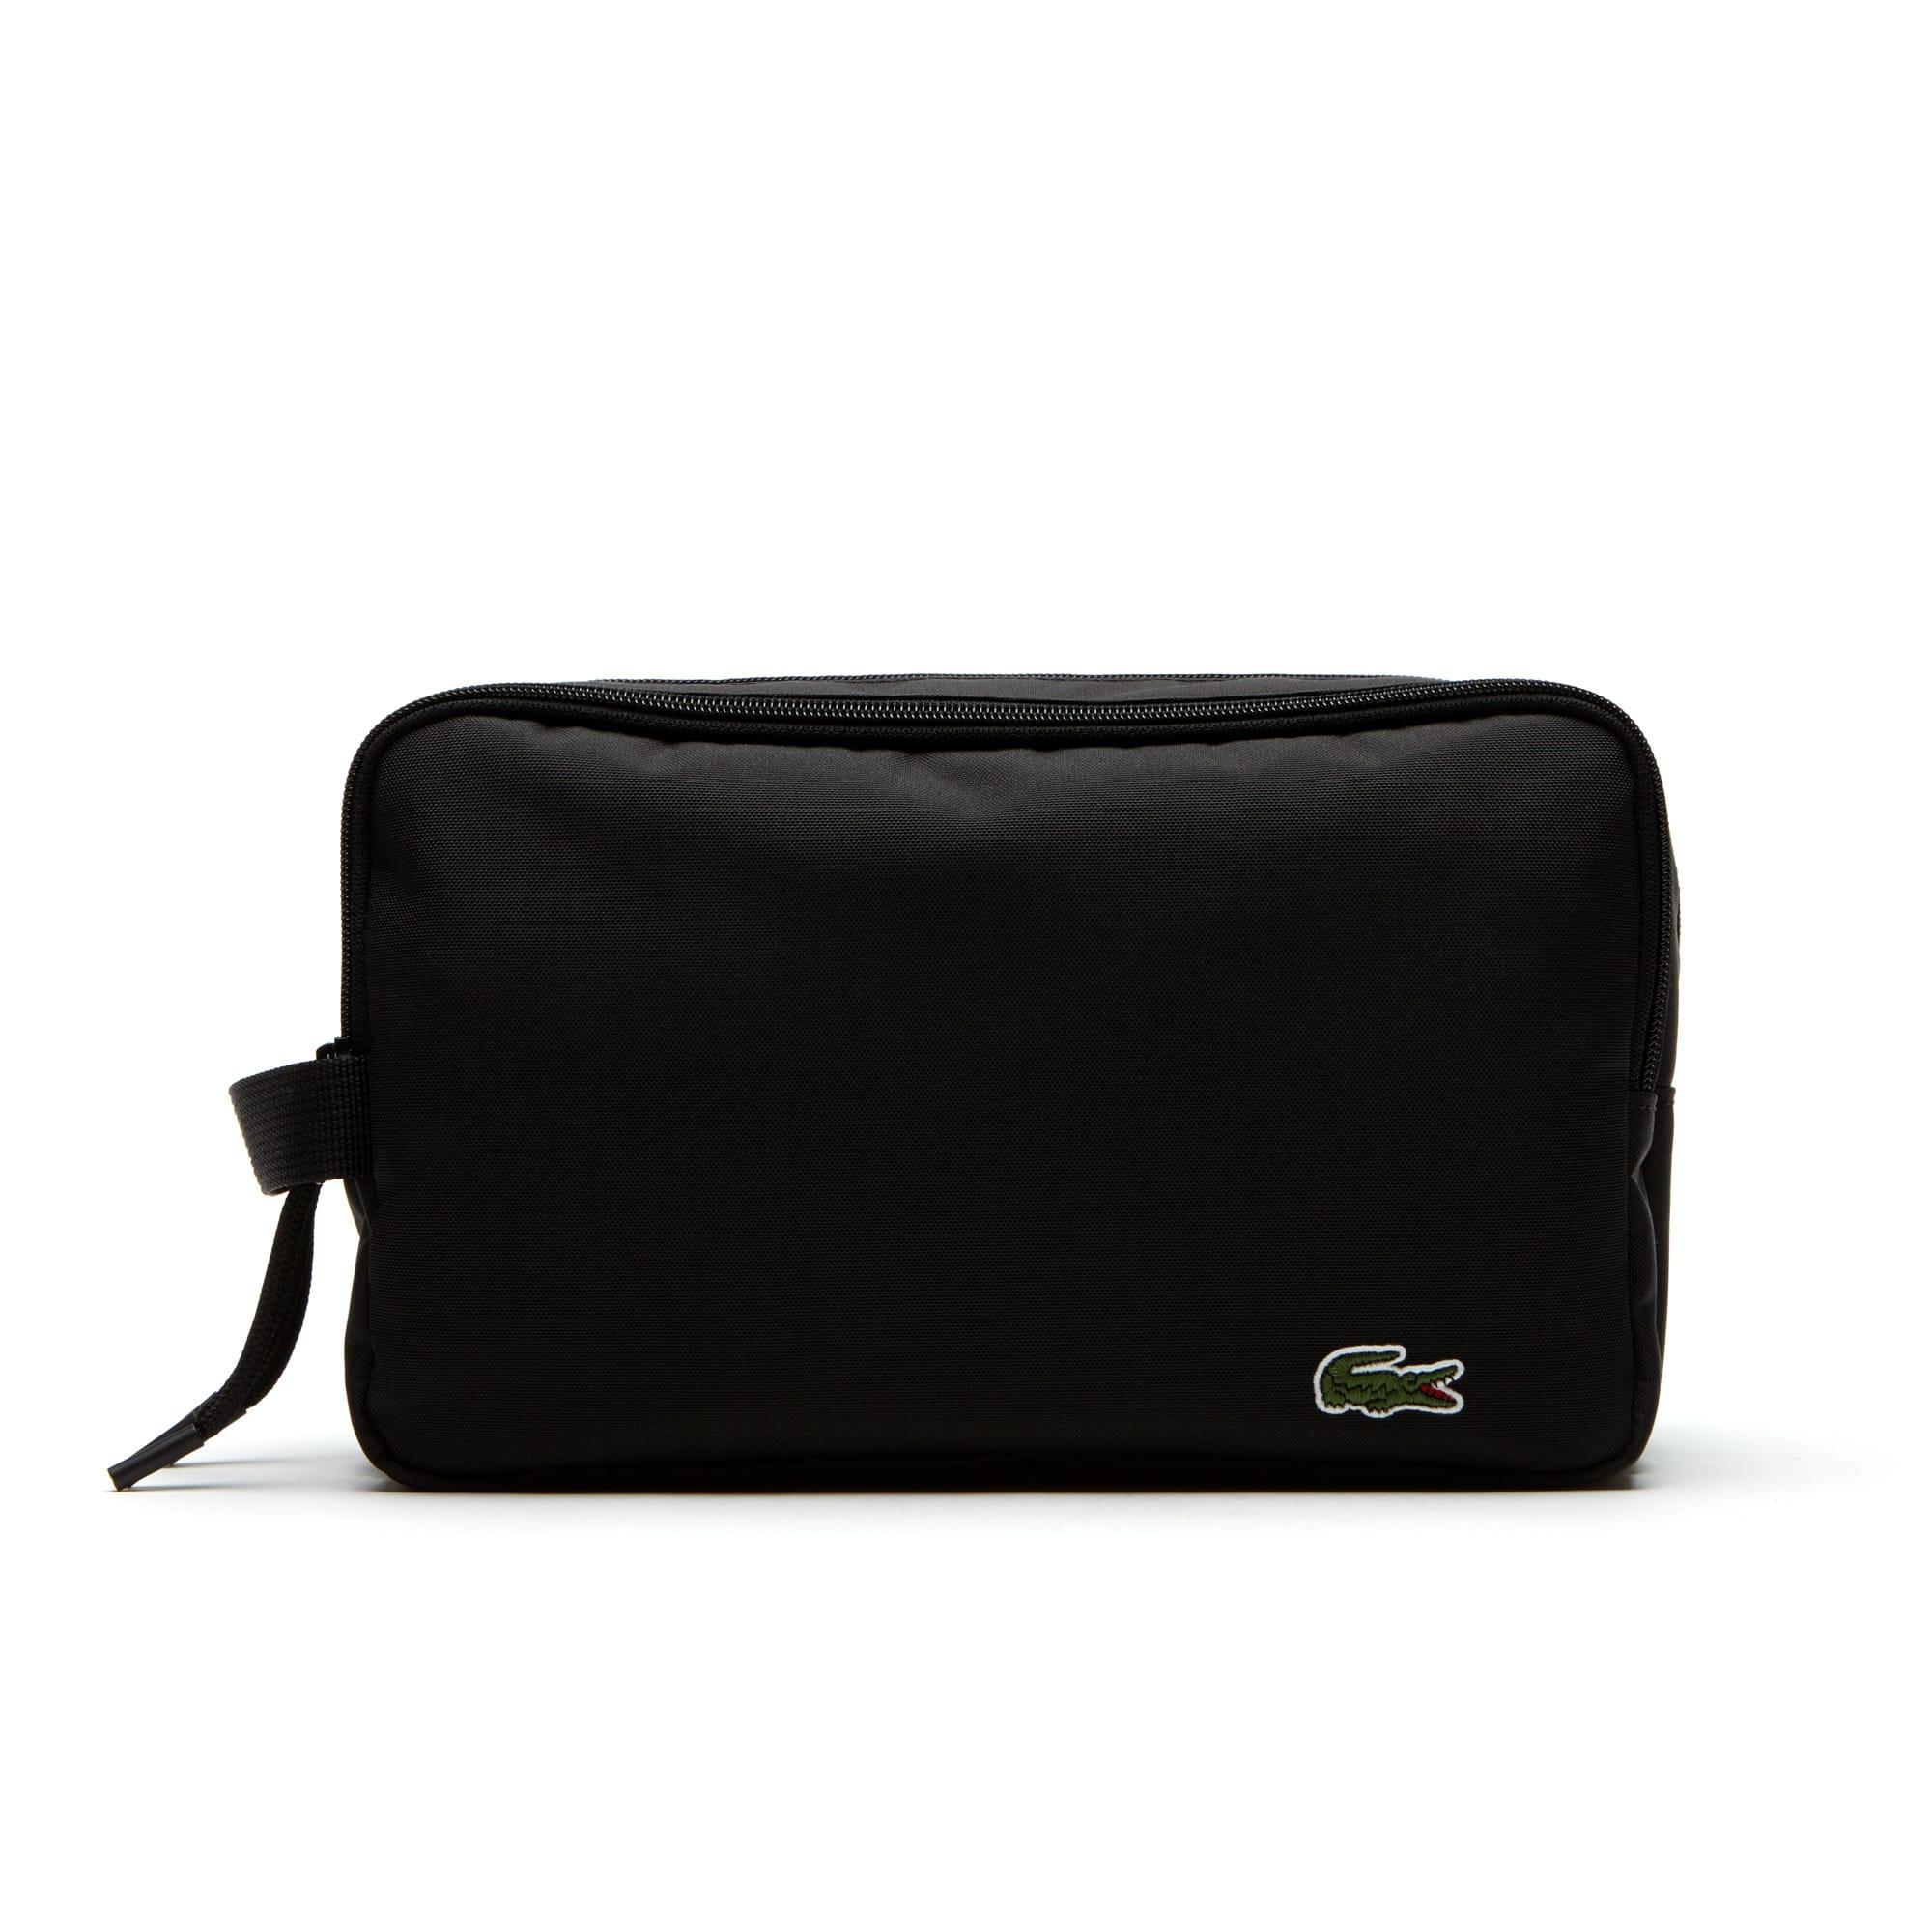 Herren-Kulturtasche mit Doppel-Reißverschluss NEOCROC